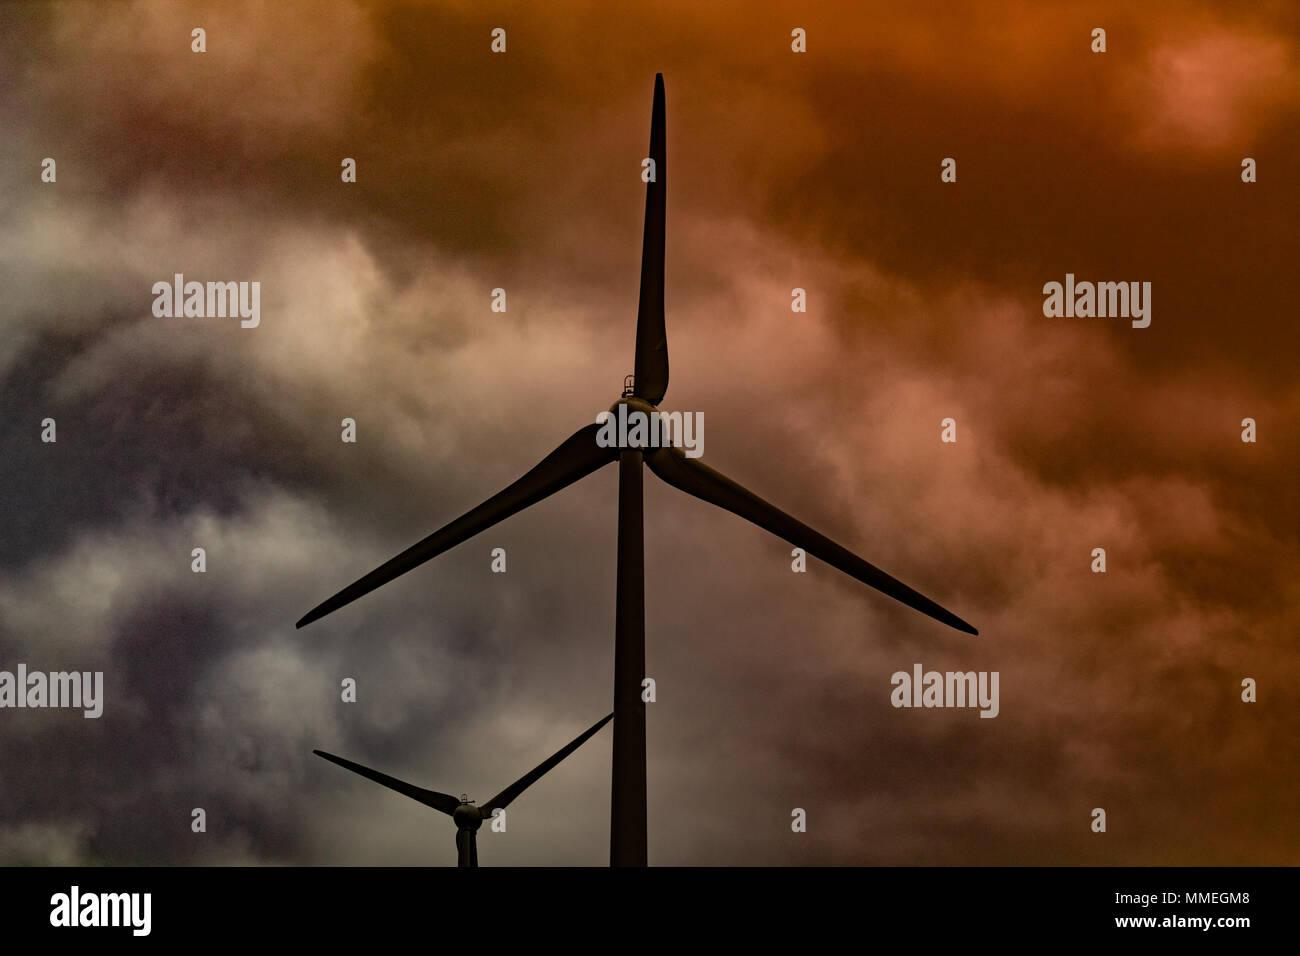 turbine blades spinning on a wind farm, windfarm on a hillside of west cork, ireland Stock Photo